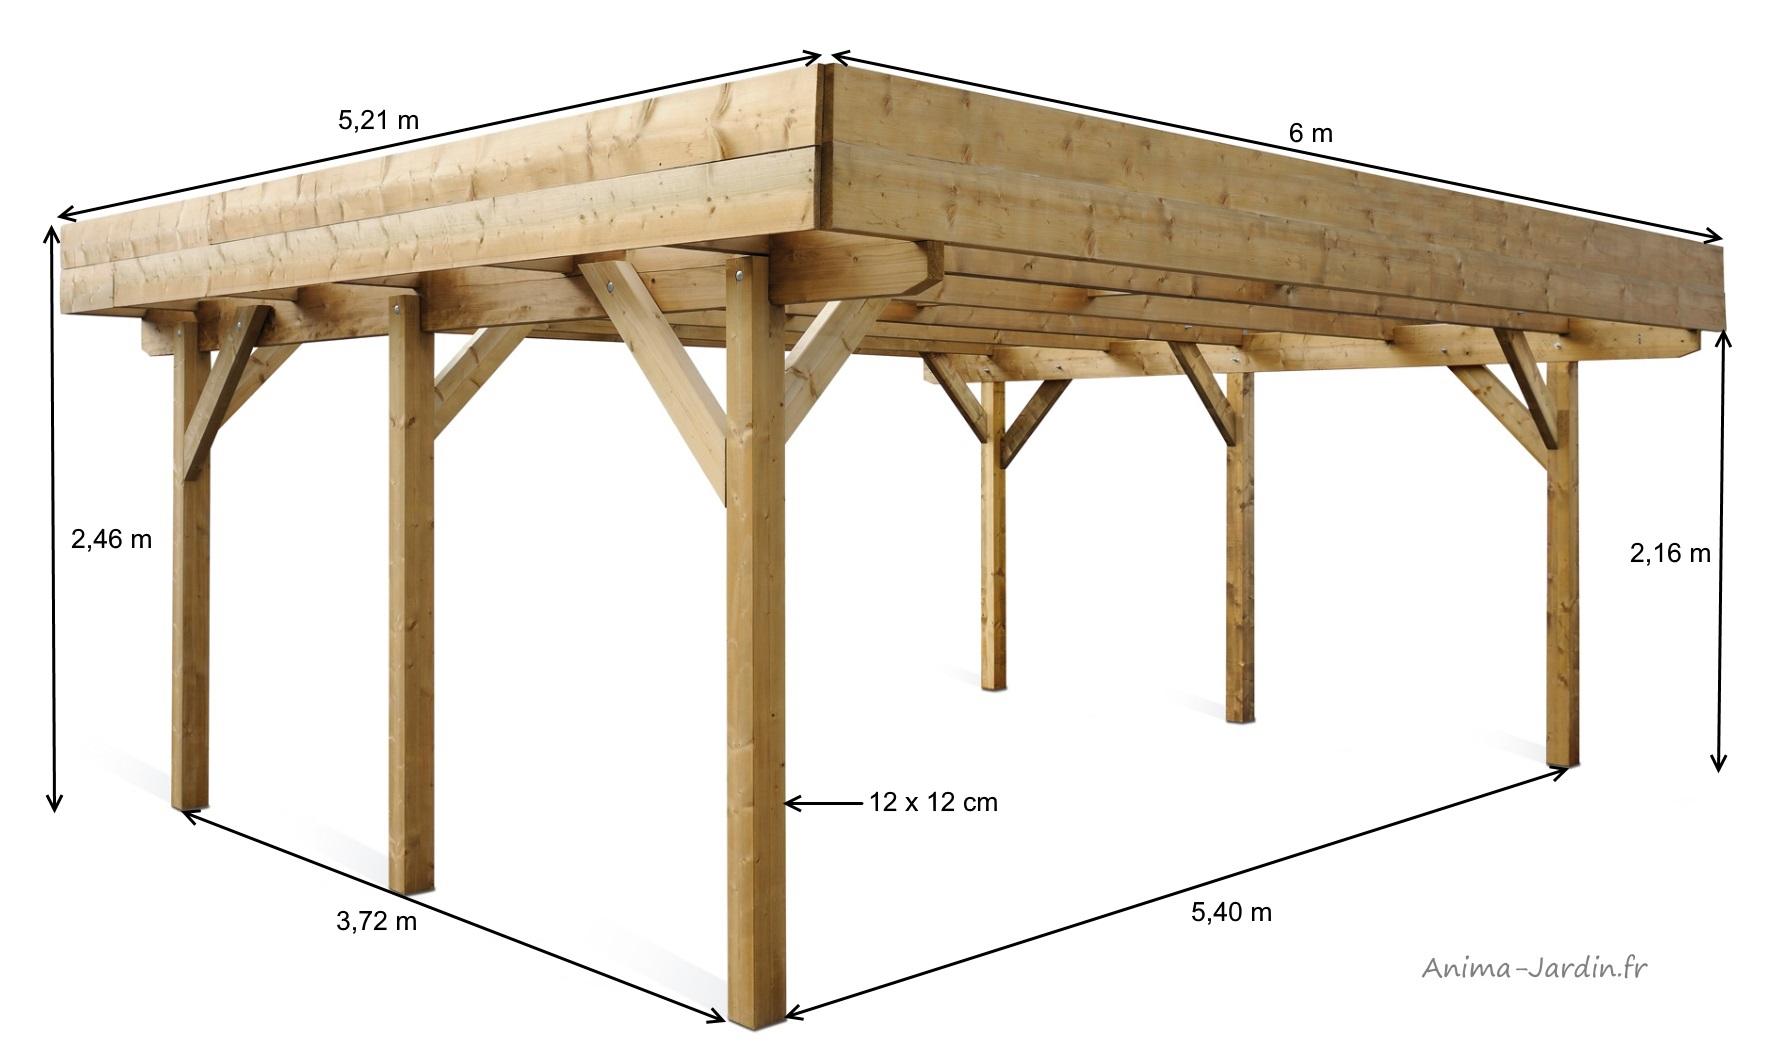 carport-bois-autoclave-voiture-anima-jardin-dimensions